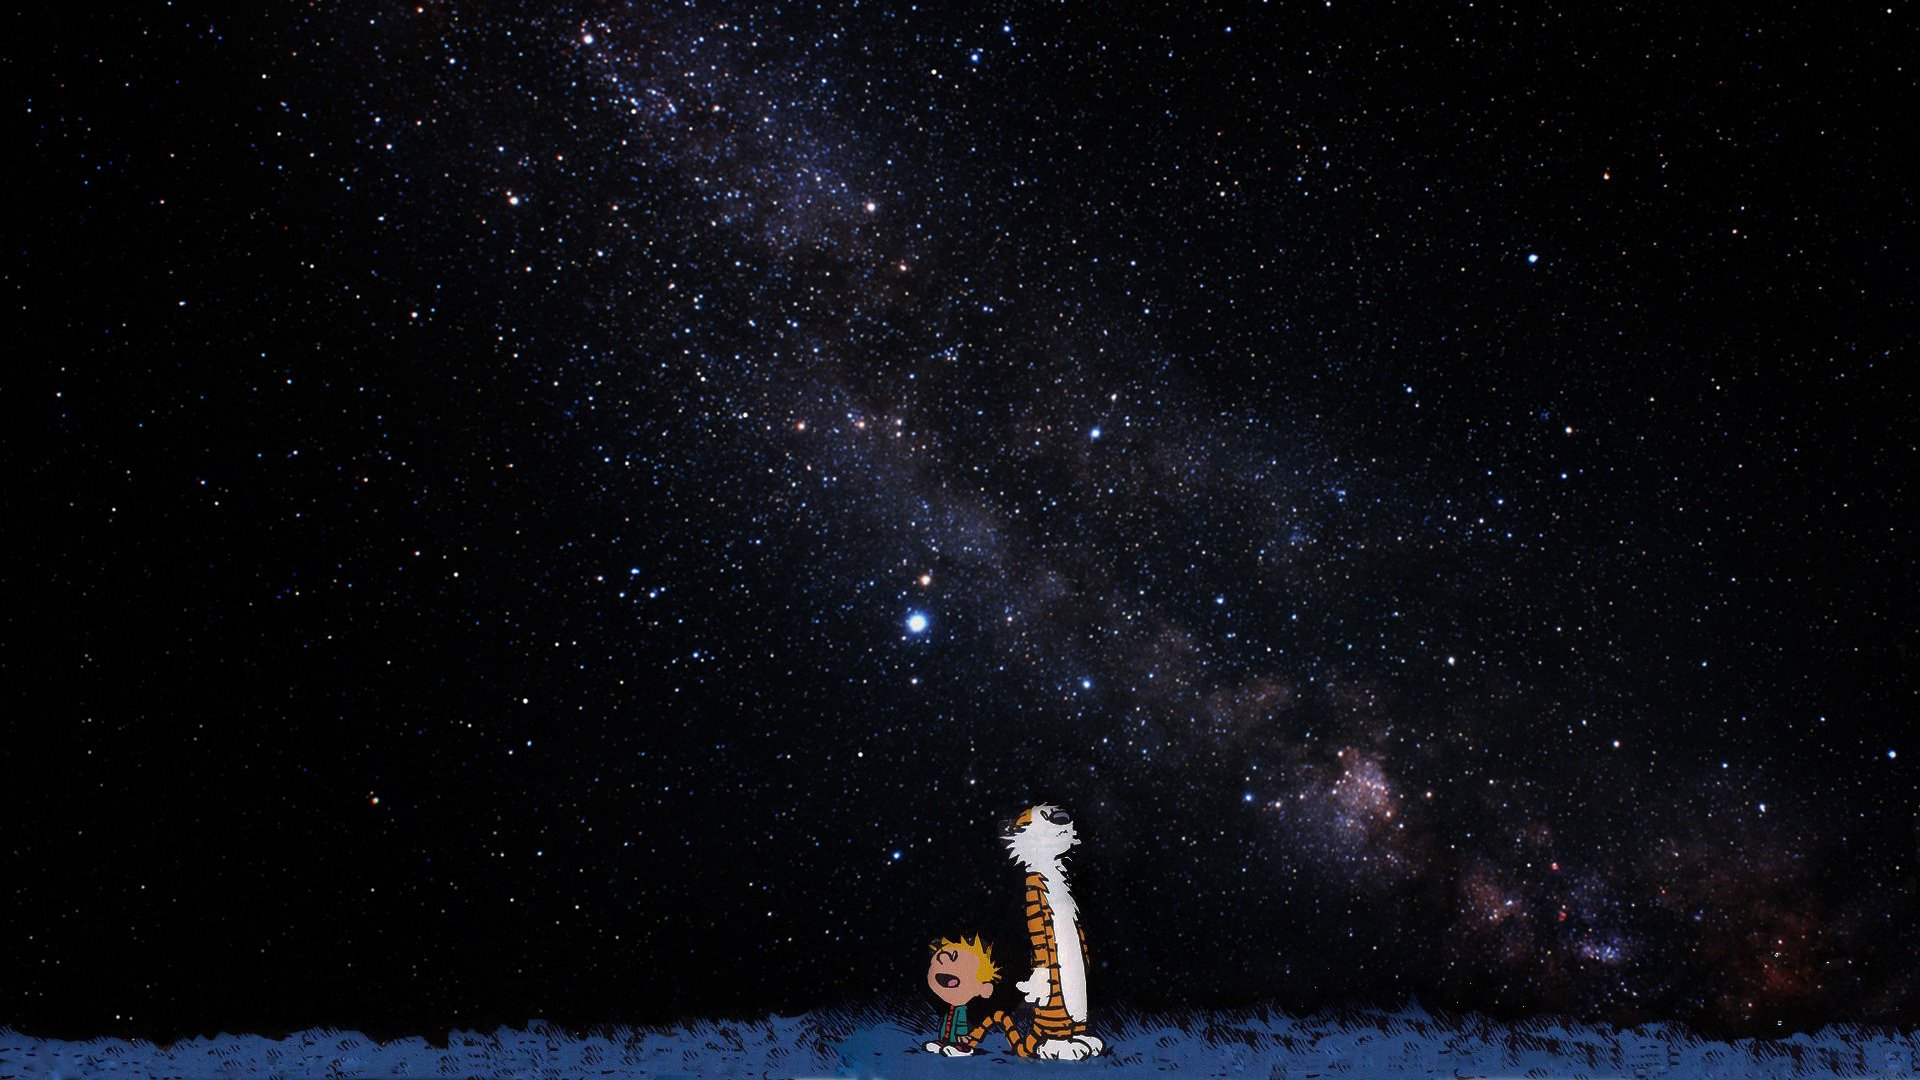 Calvin And Hobbes Stars wallpaper 180339 1920x1080